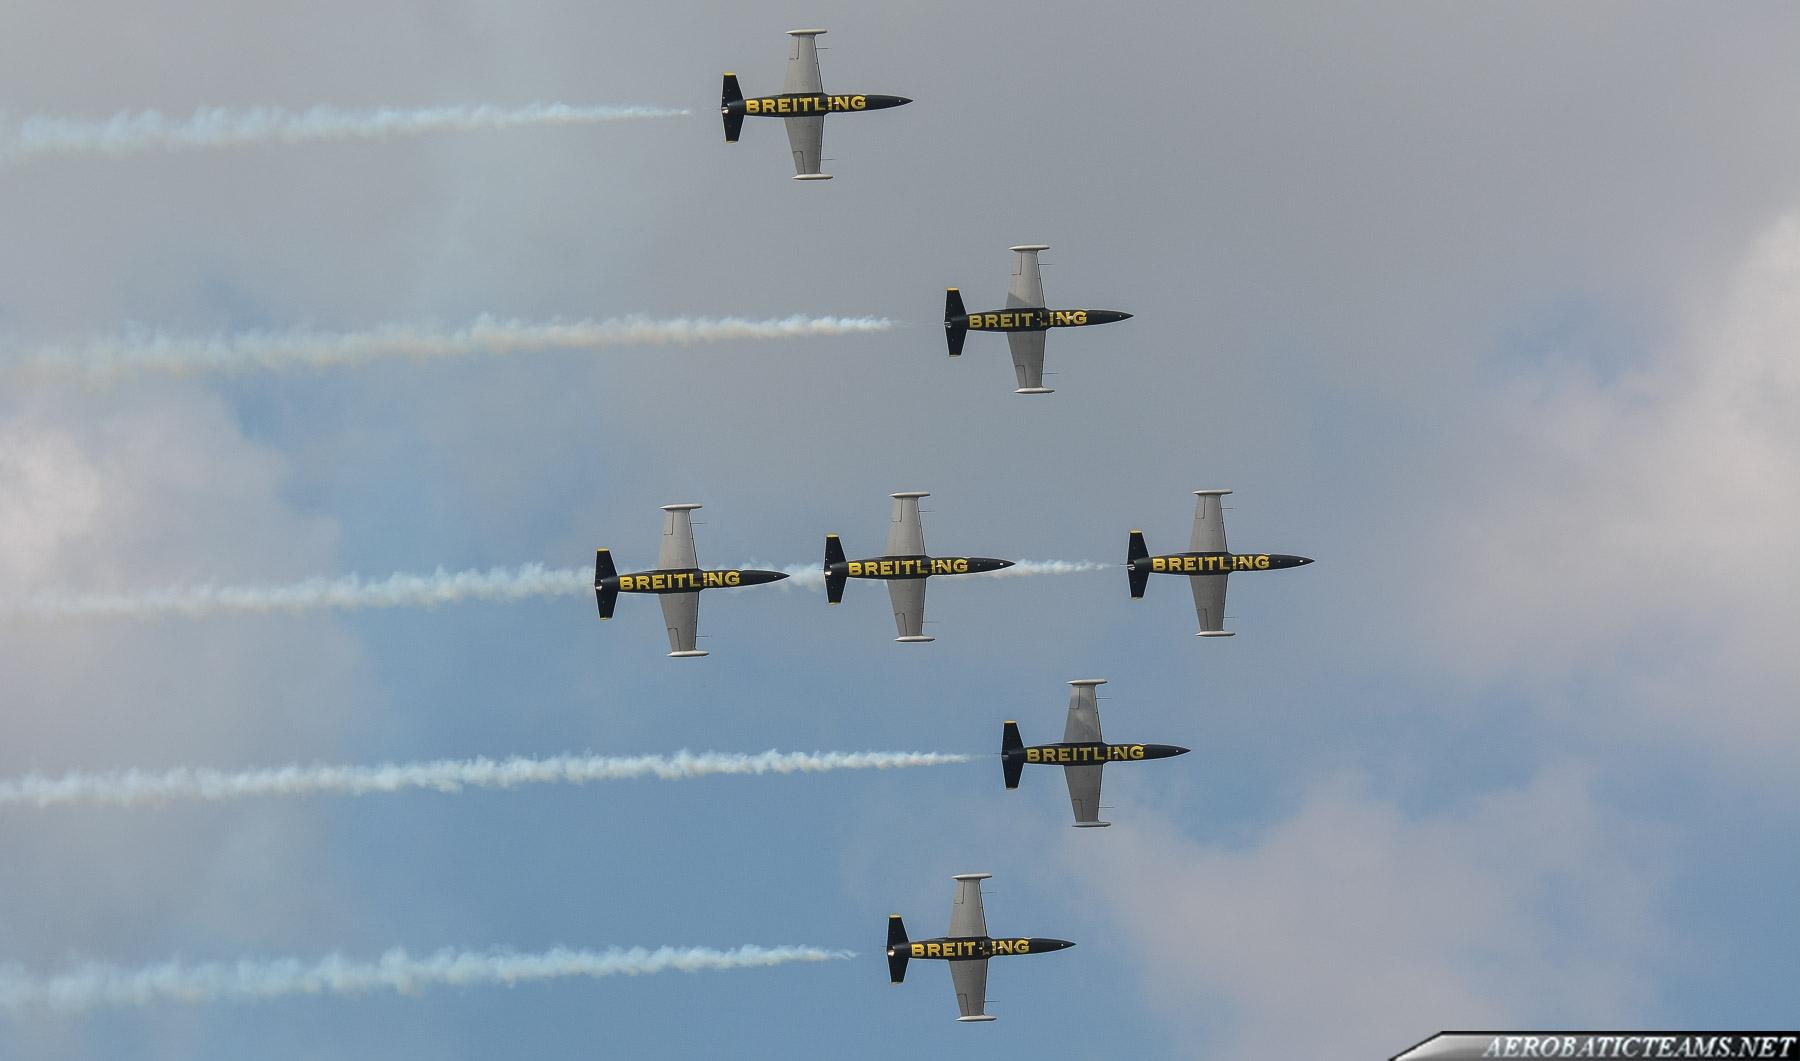 Breitling Jet Team L-39C Gallery